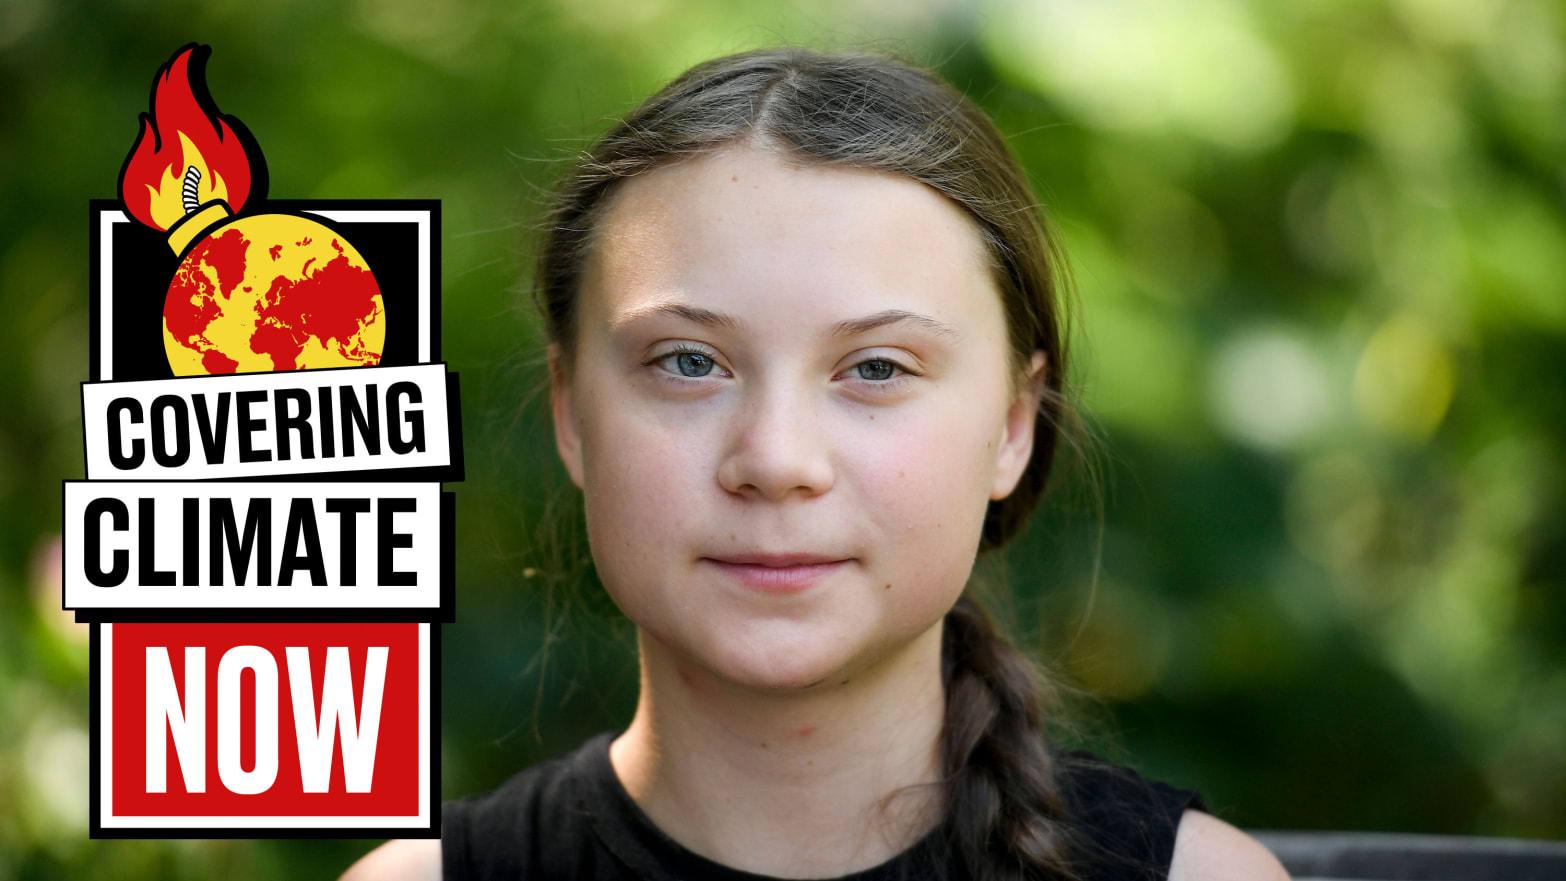 Greta Thunberg Is the Climate Heroine We Need